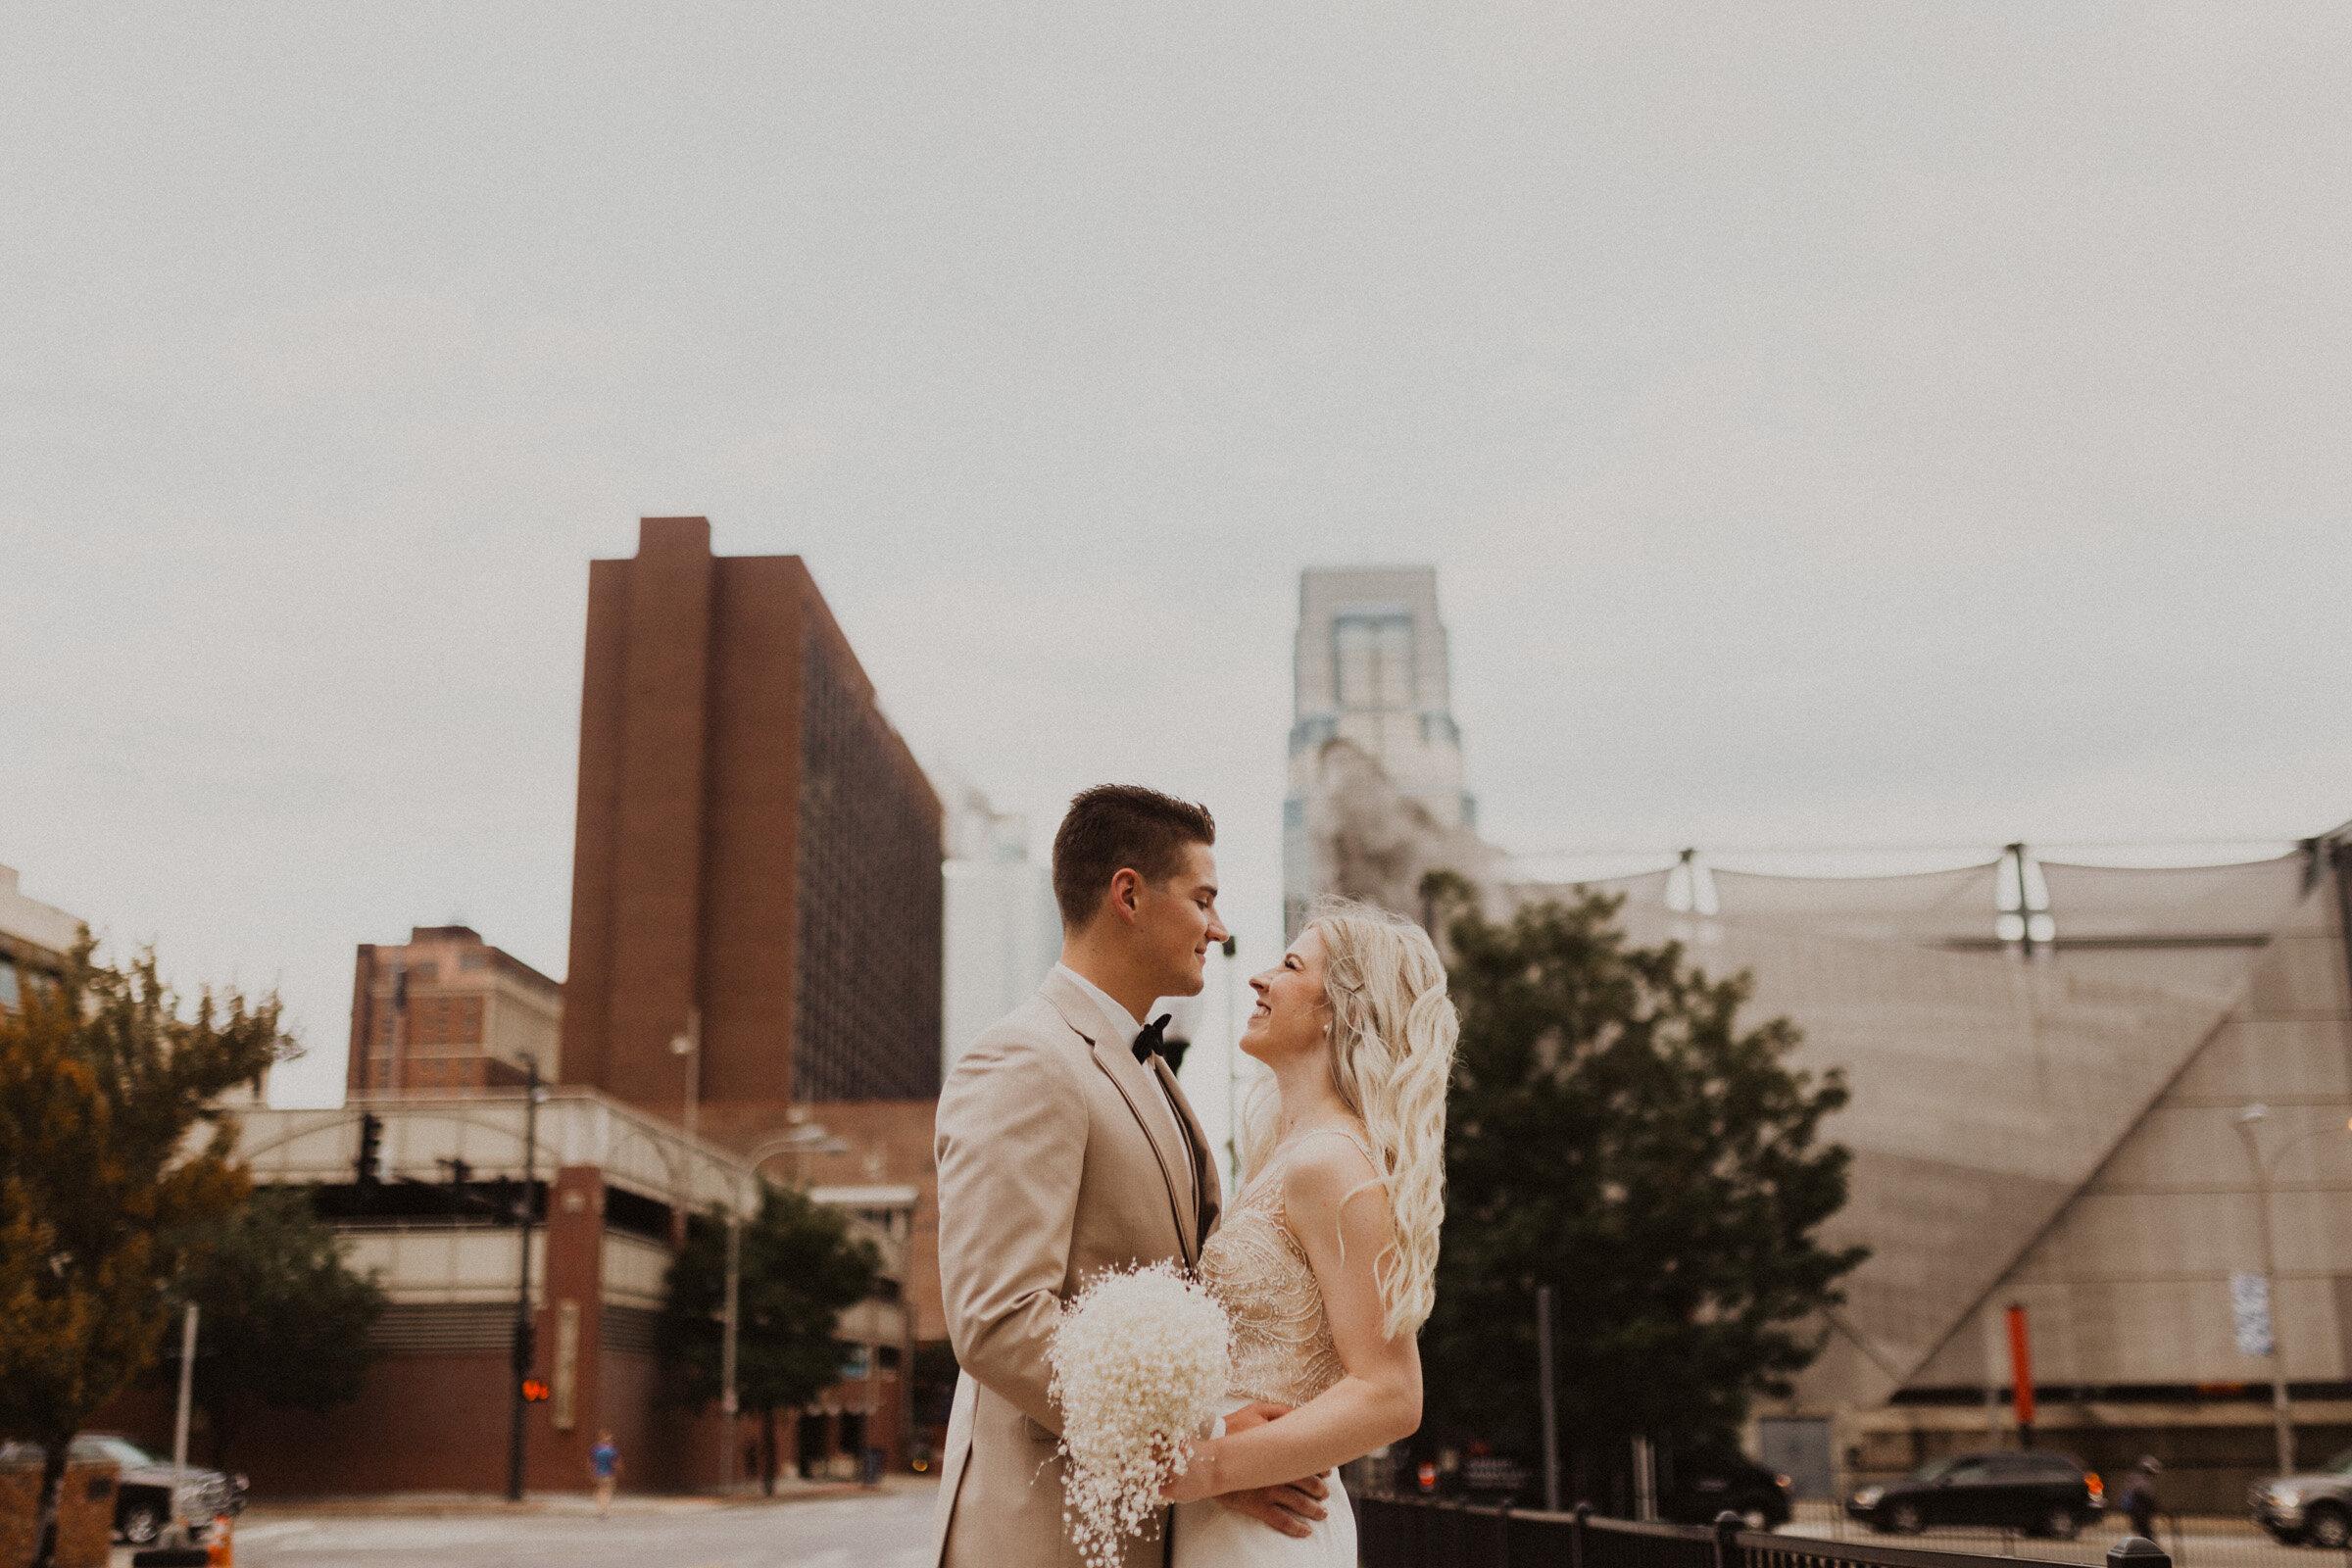 alyssa barletter photography downtown kansas city wedding boulevard brewery reception rainy day wedding-40.jpg